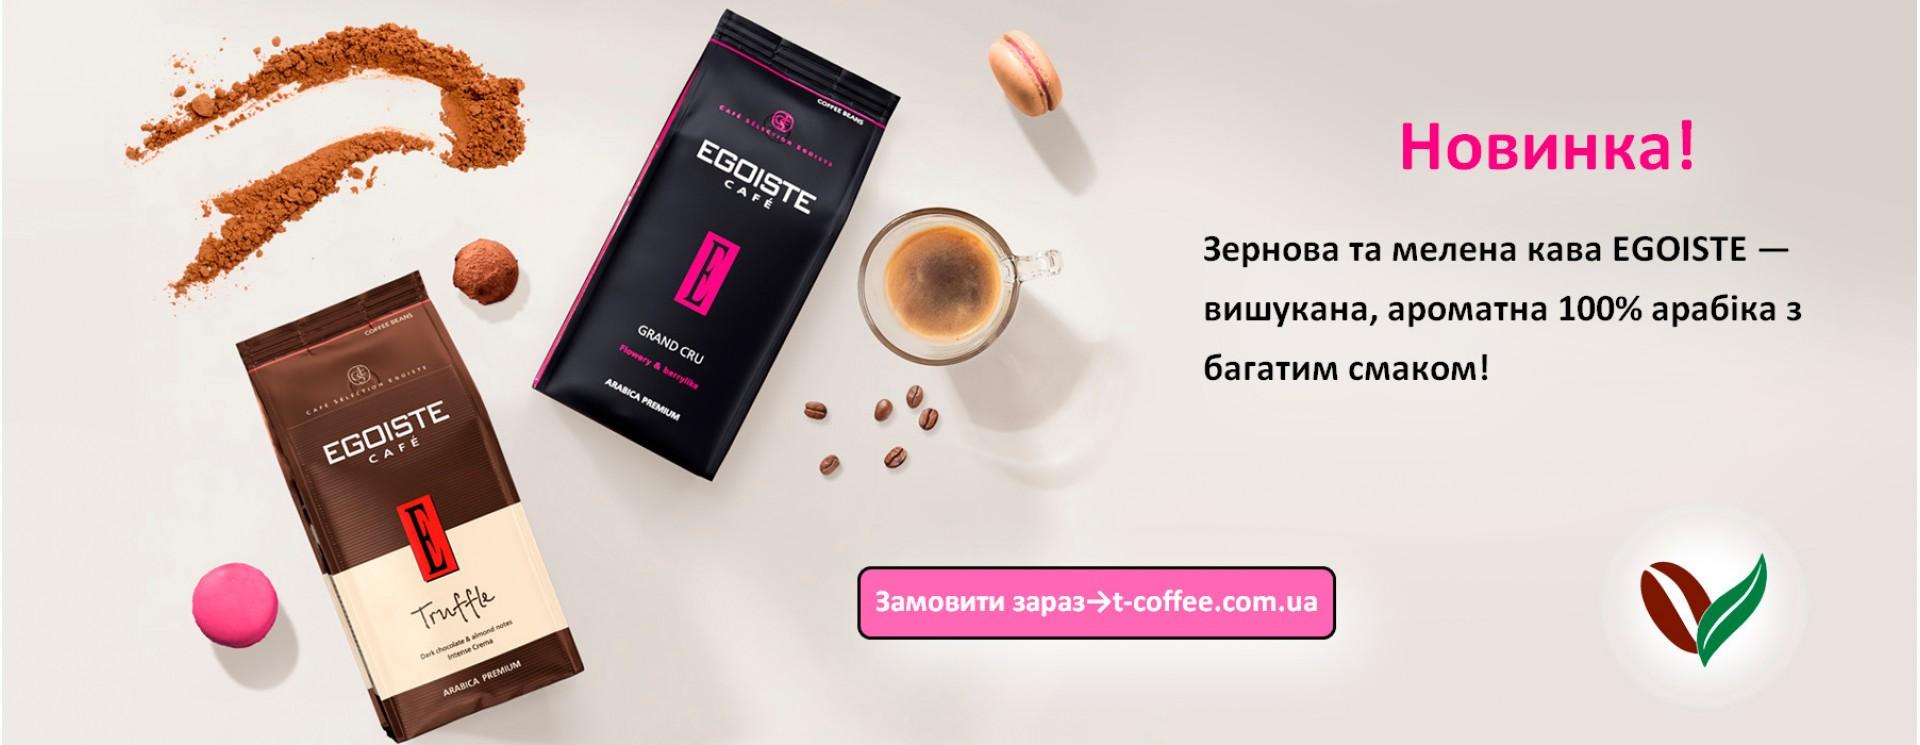 Спробуйте нову каву EGOISTE!